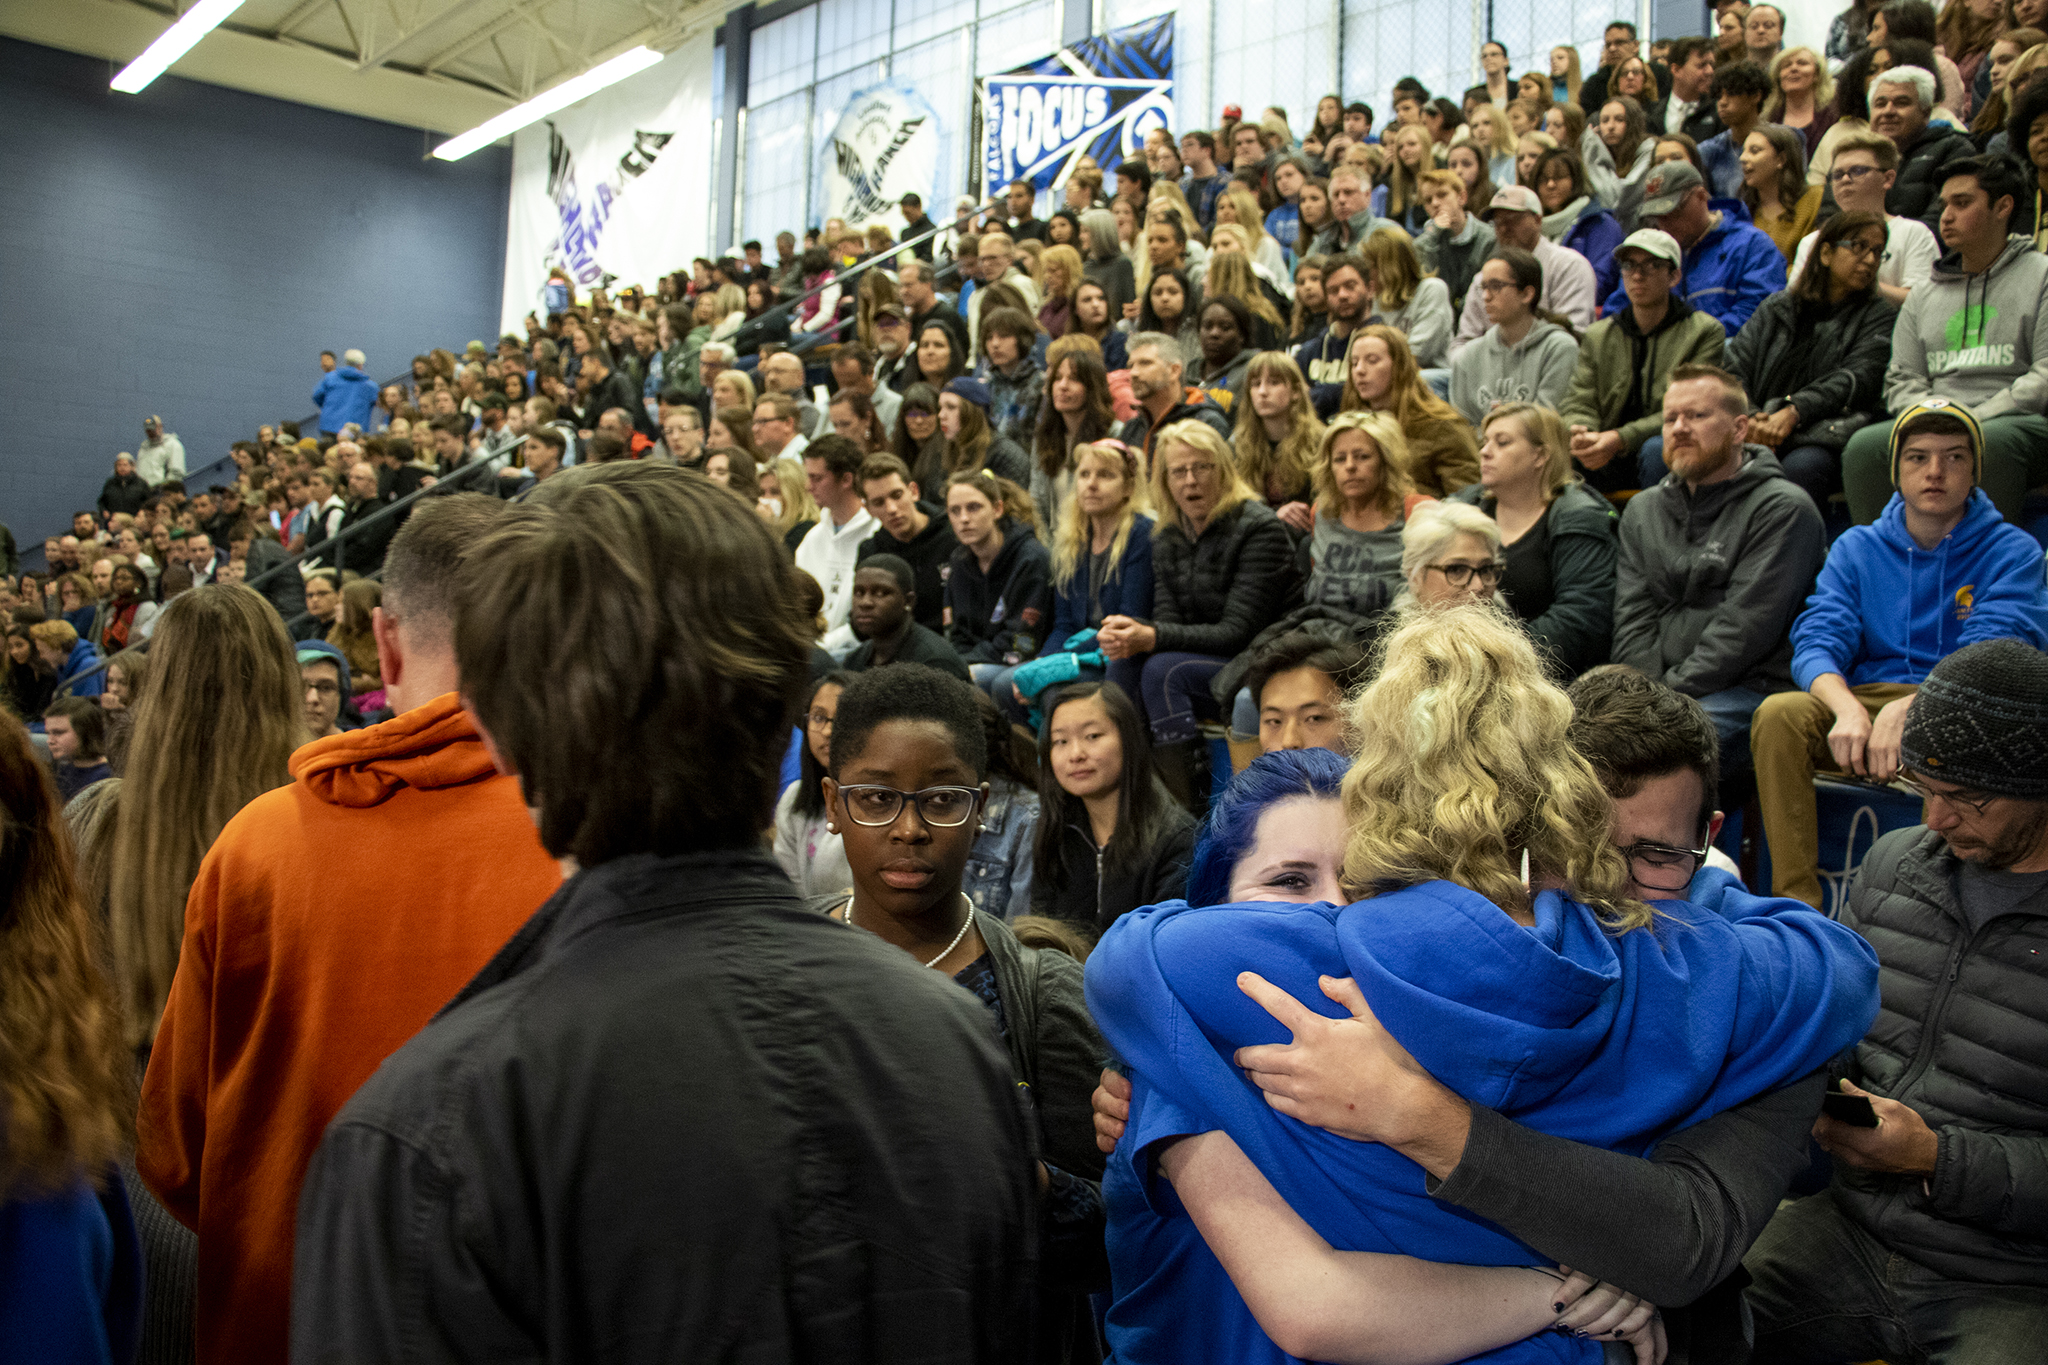 Photo: STEM School Highlands Ranch shooting vigil